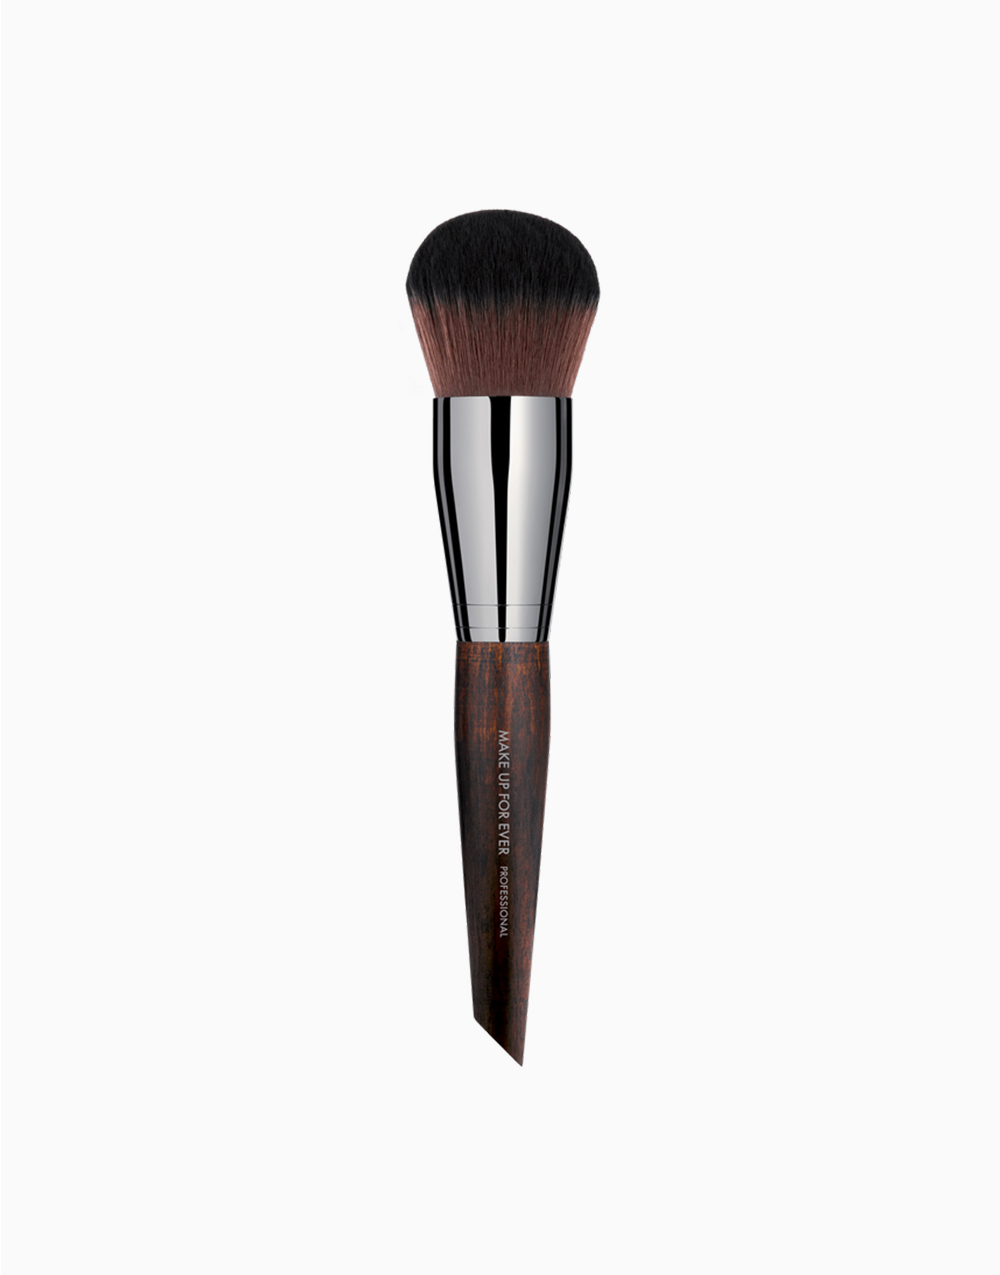 126 Medium Powder Brush by Make Up For Ever